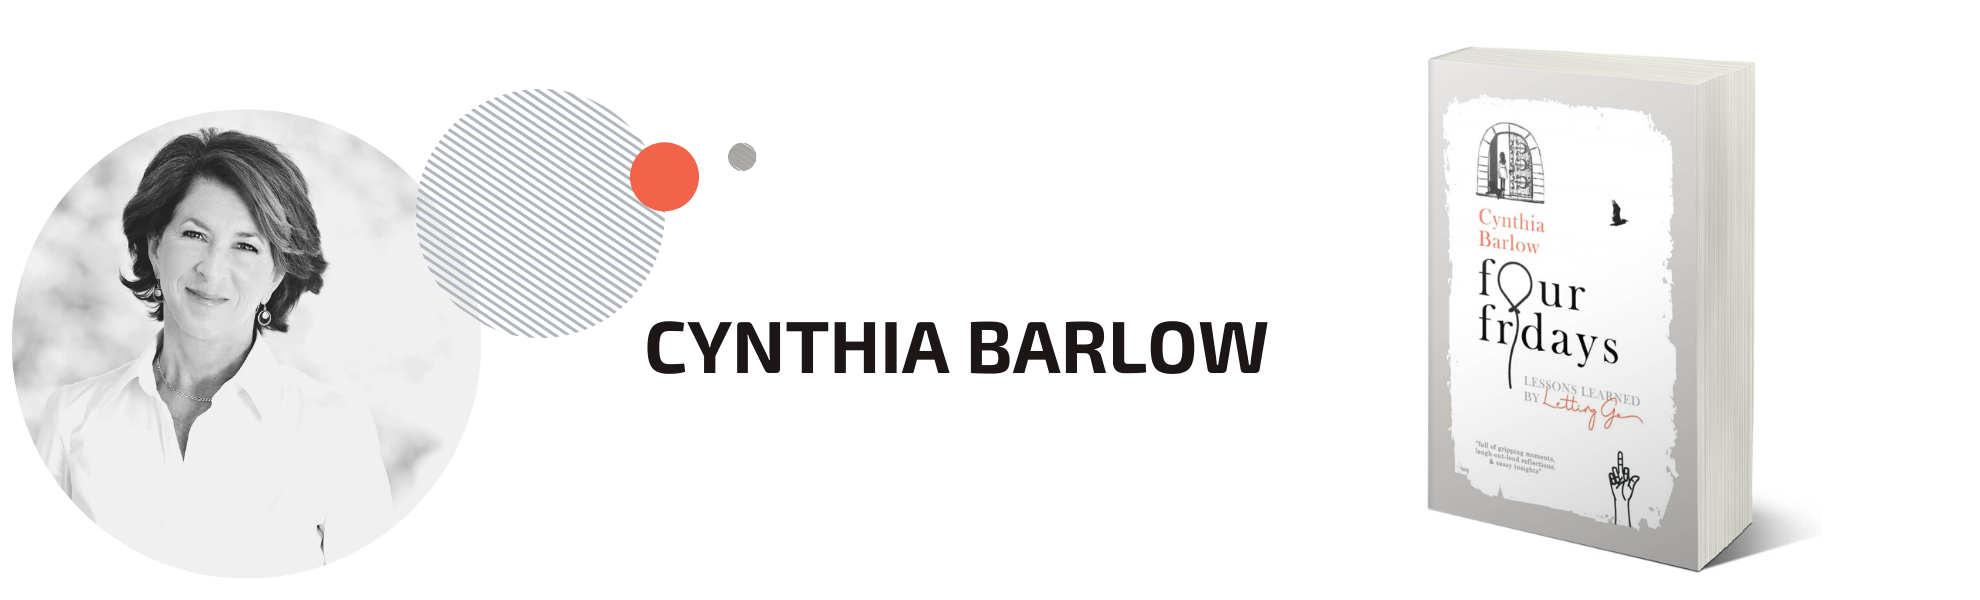 Cynthia Barlow Header